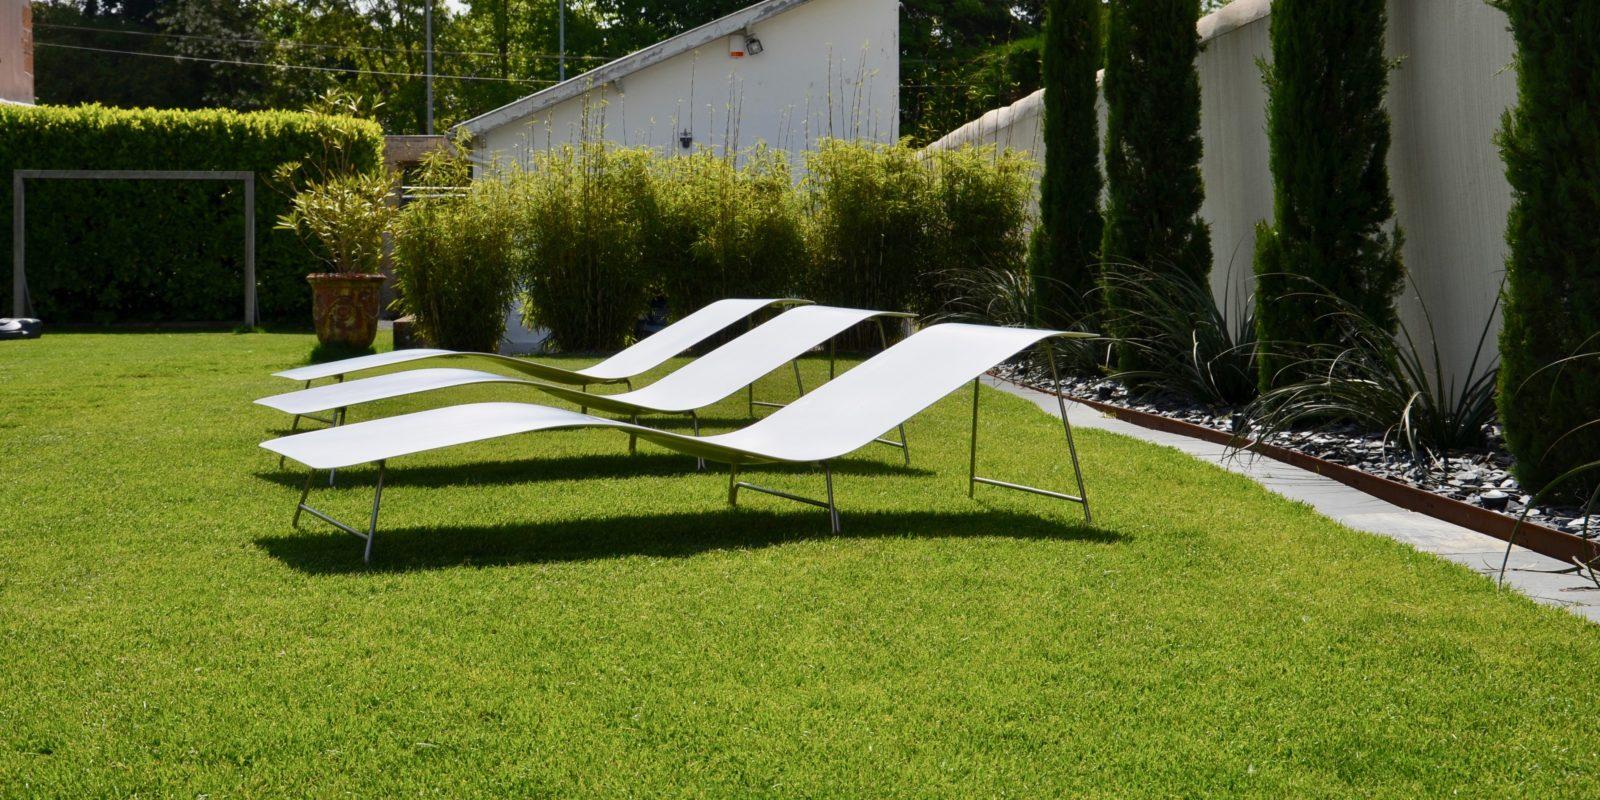 Mobilier jardin contemporain - Buxus / Mobilier outdoor